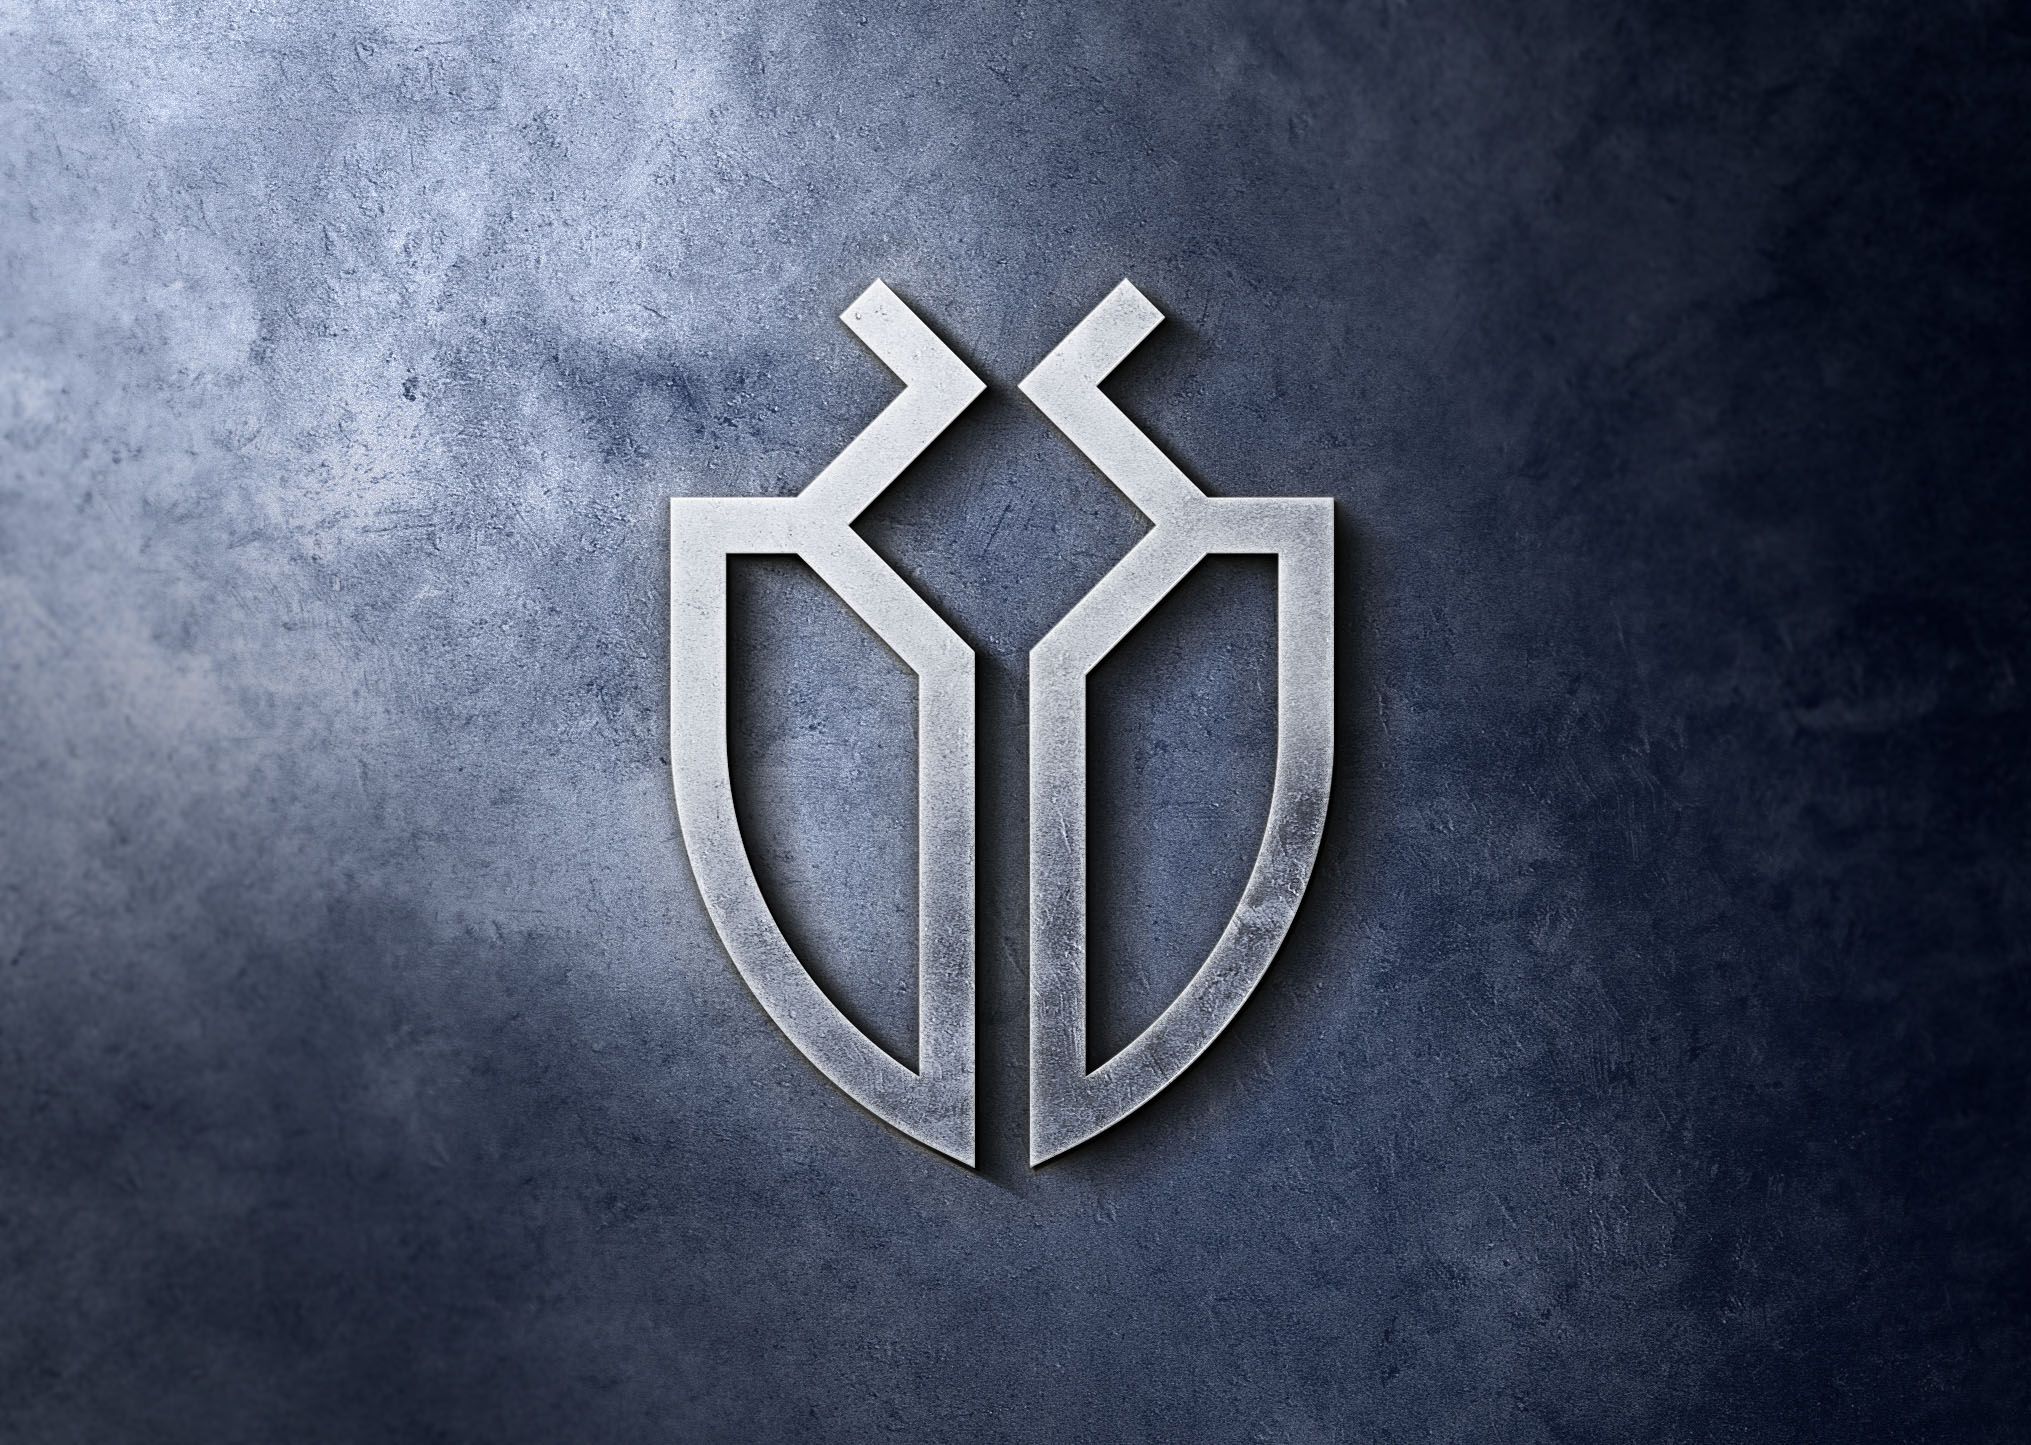 Нужен логотип (эмблема) для самодельного квадроцикла фото f_1115afc95e78a129.jpg